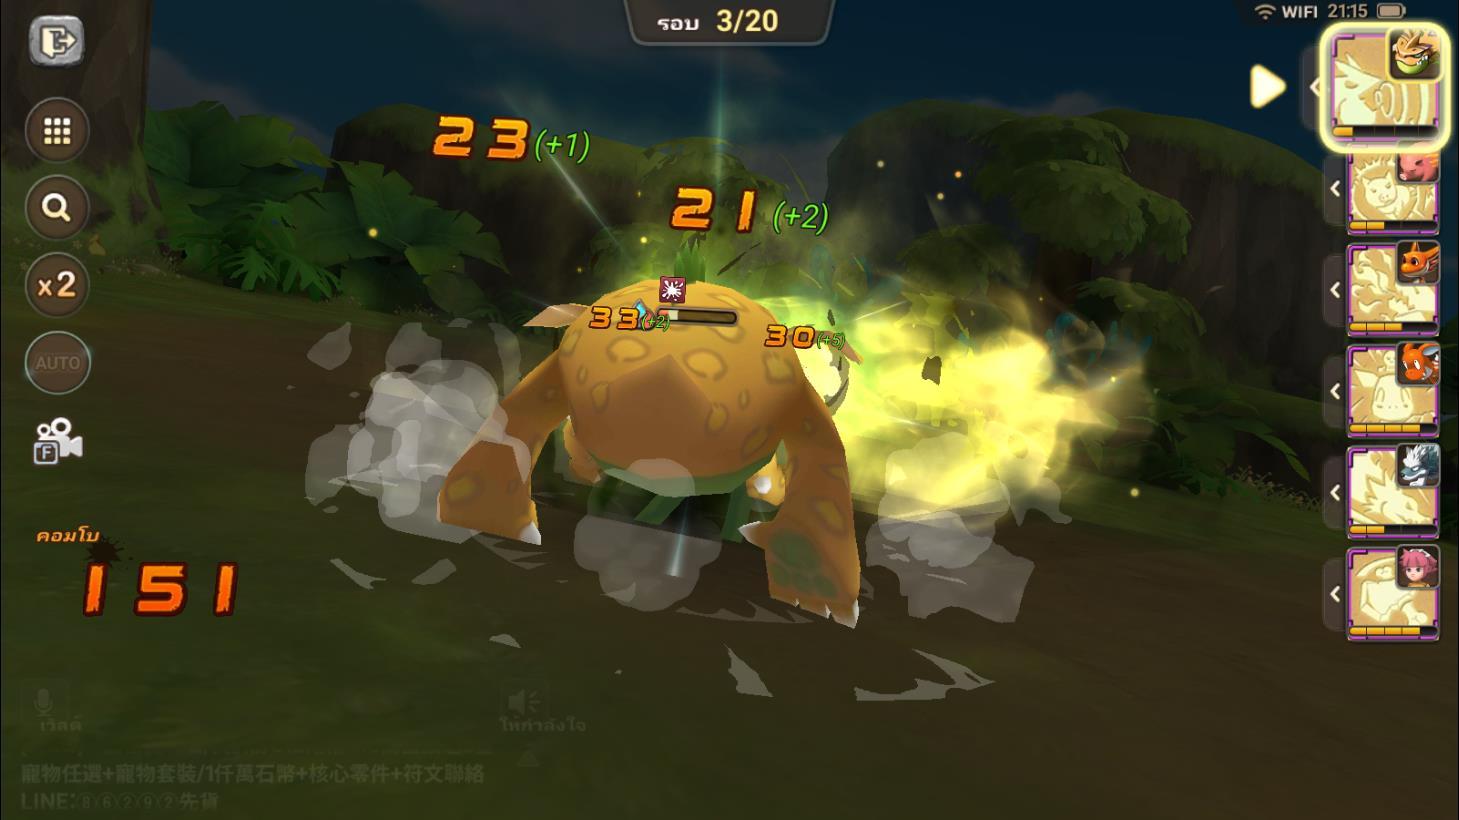 StoneAge World Screenshot 2020.06.24 19.15.49